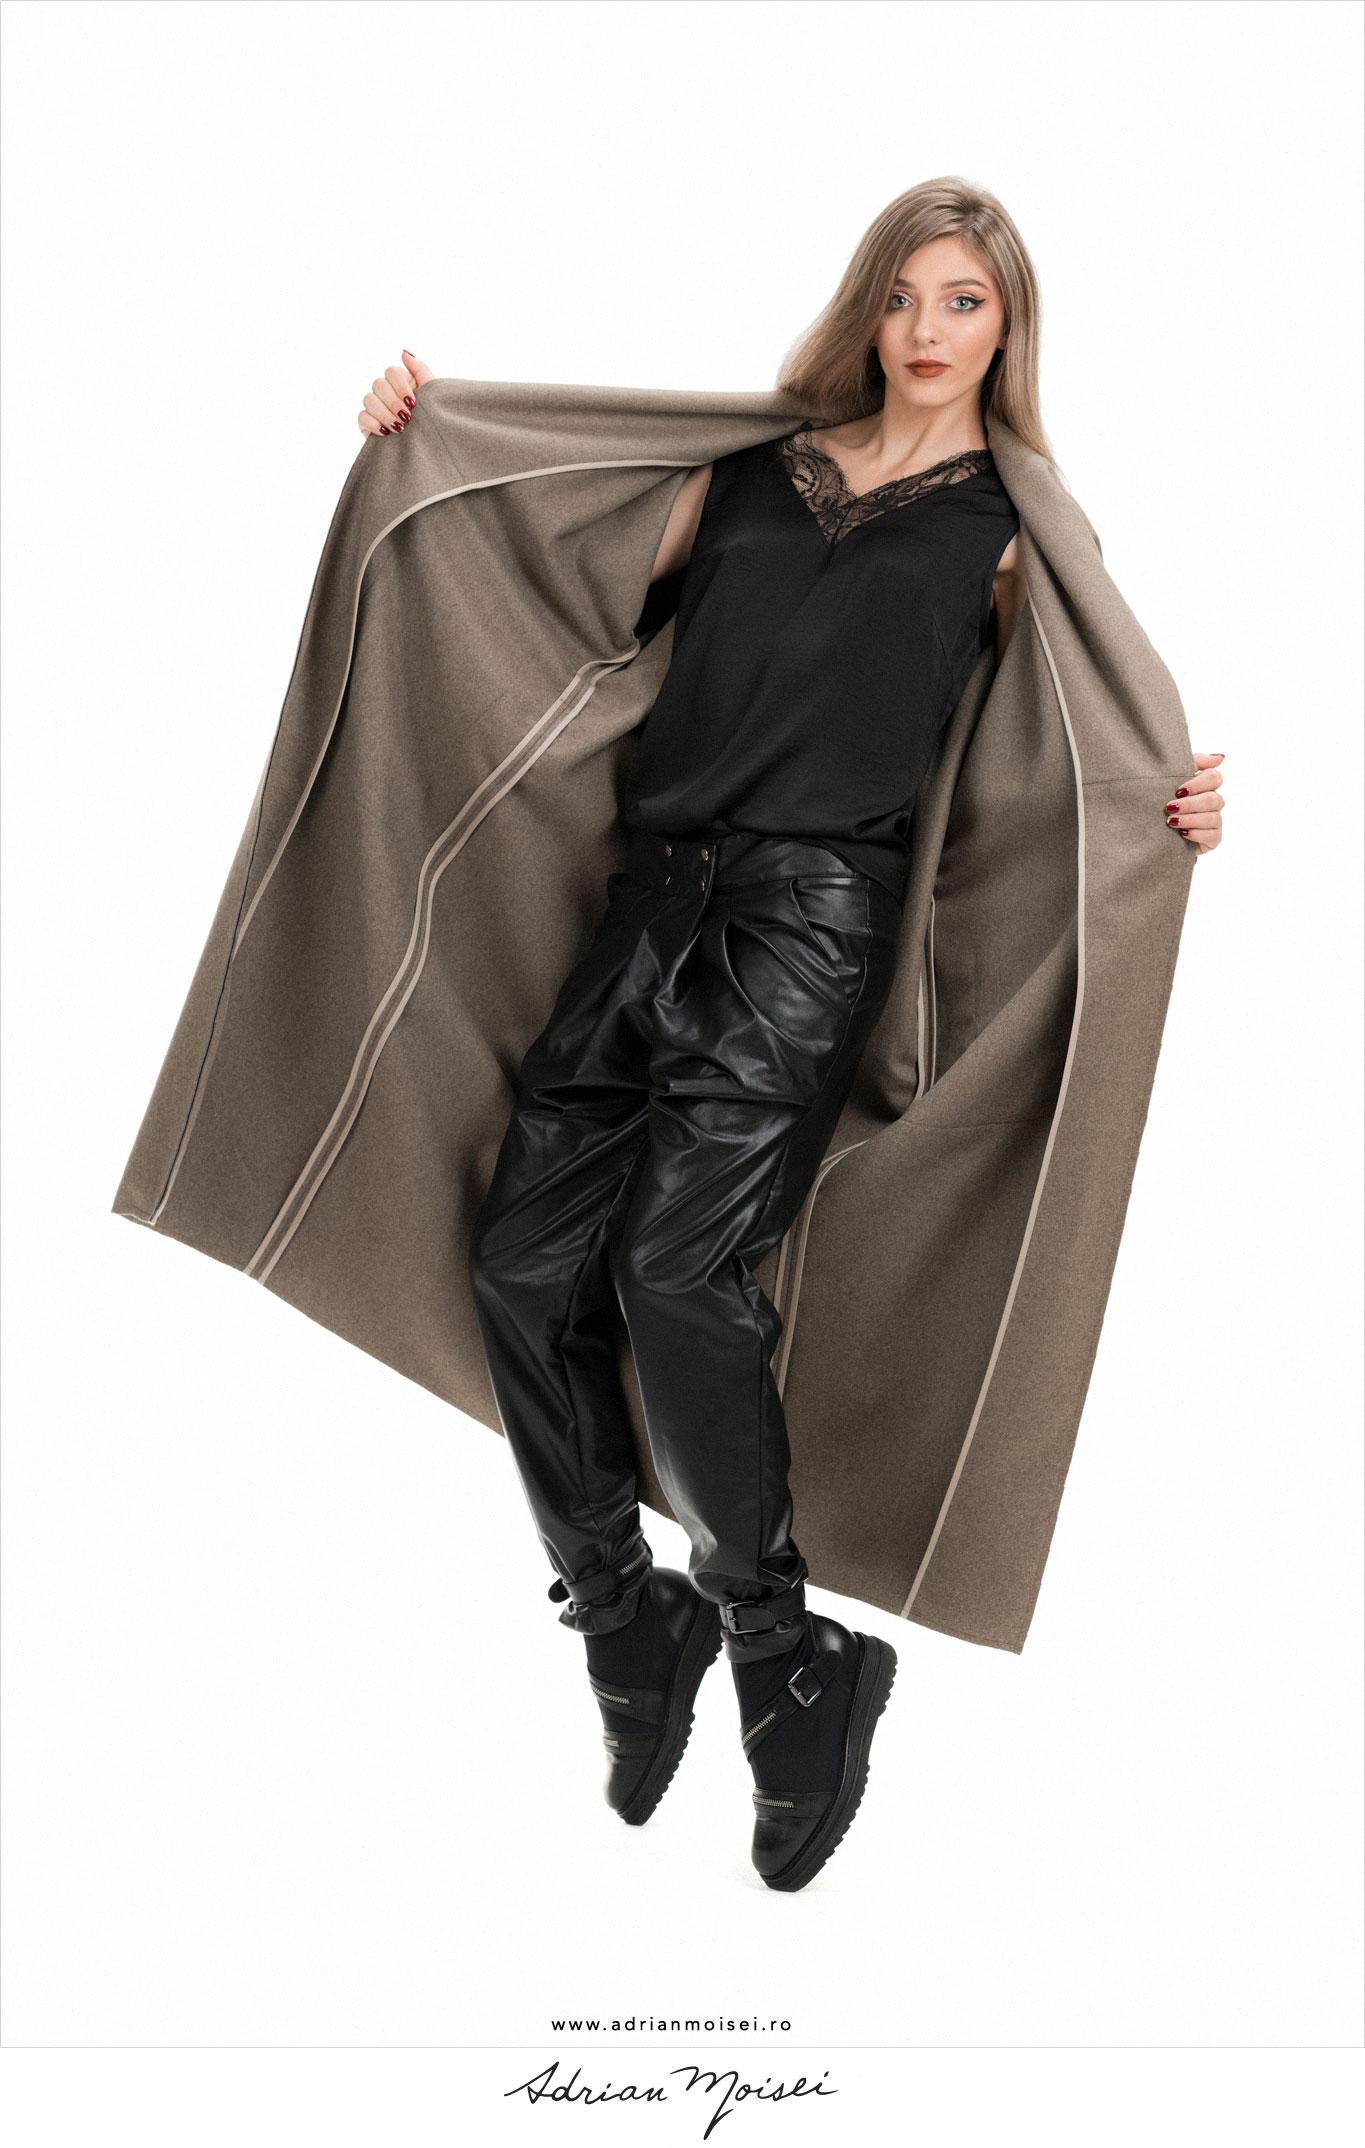 Fotograf fashion Iasi pentru magazinul online Agness by Mary Sten. Fotografii realizate in studioul foto-video adrianmoisei.ro